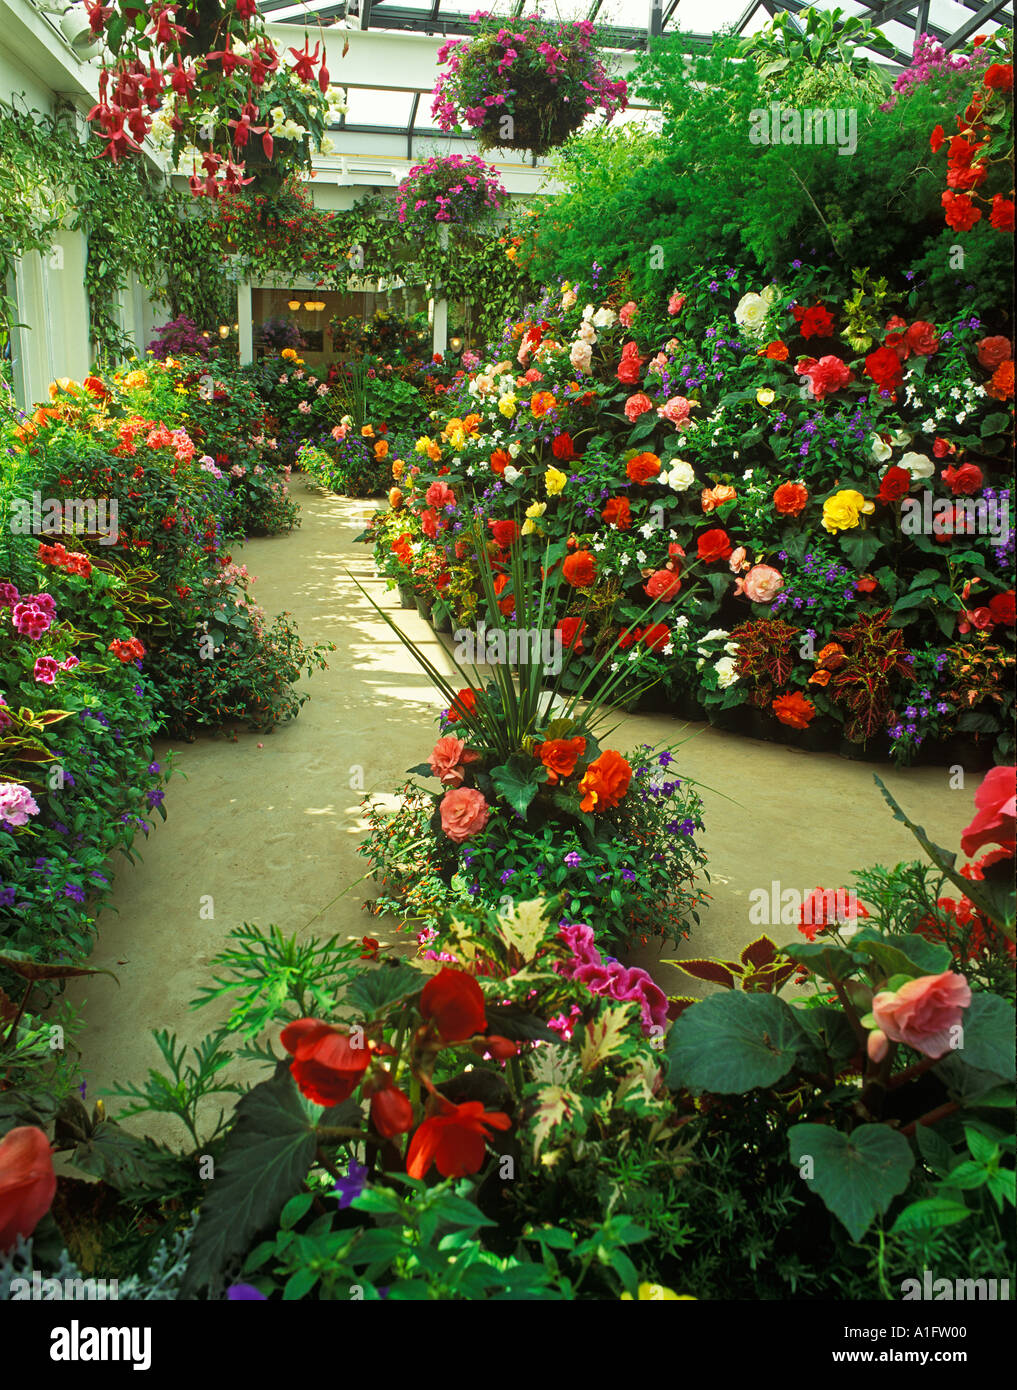 Greenhouse Flowers Butchart Gardens Victoria British